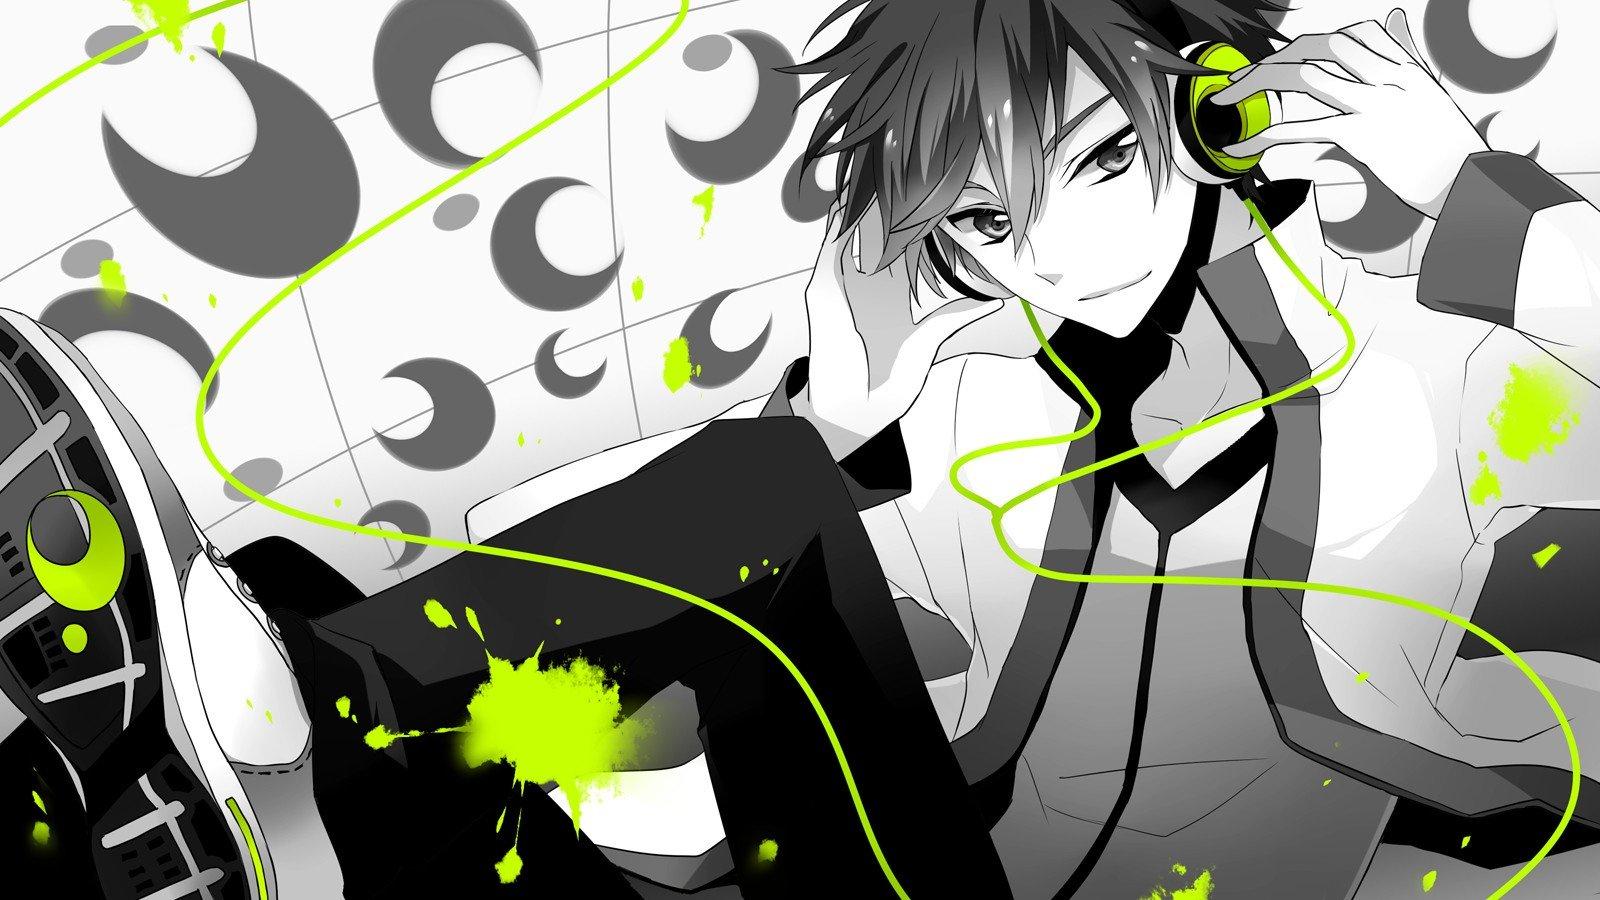 Wallpaper 1600x900 Px Anime Headphones Vocaloid 1600x900